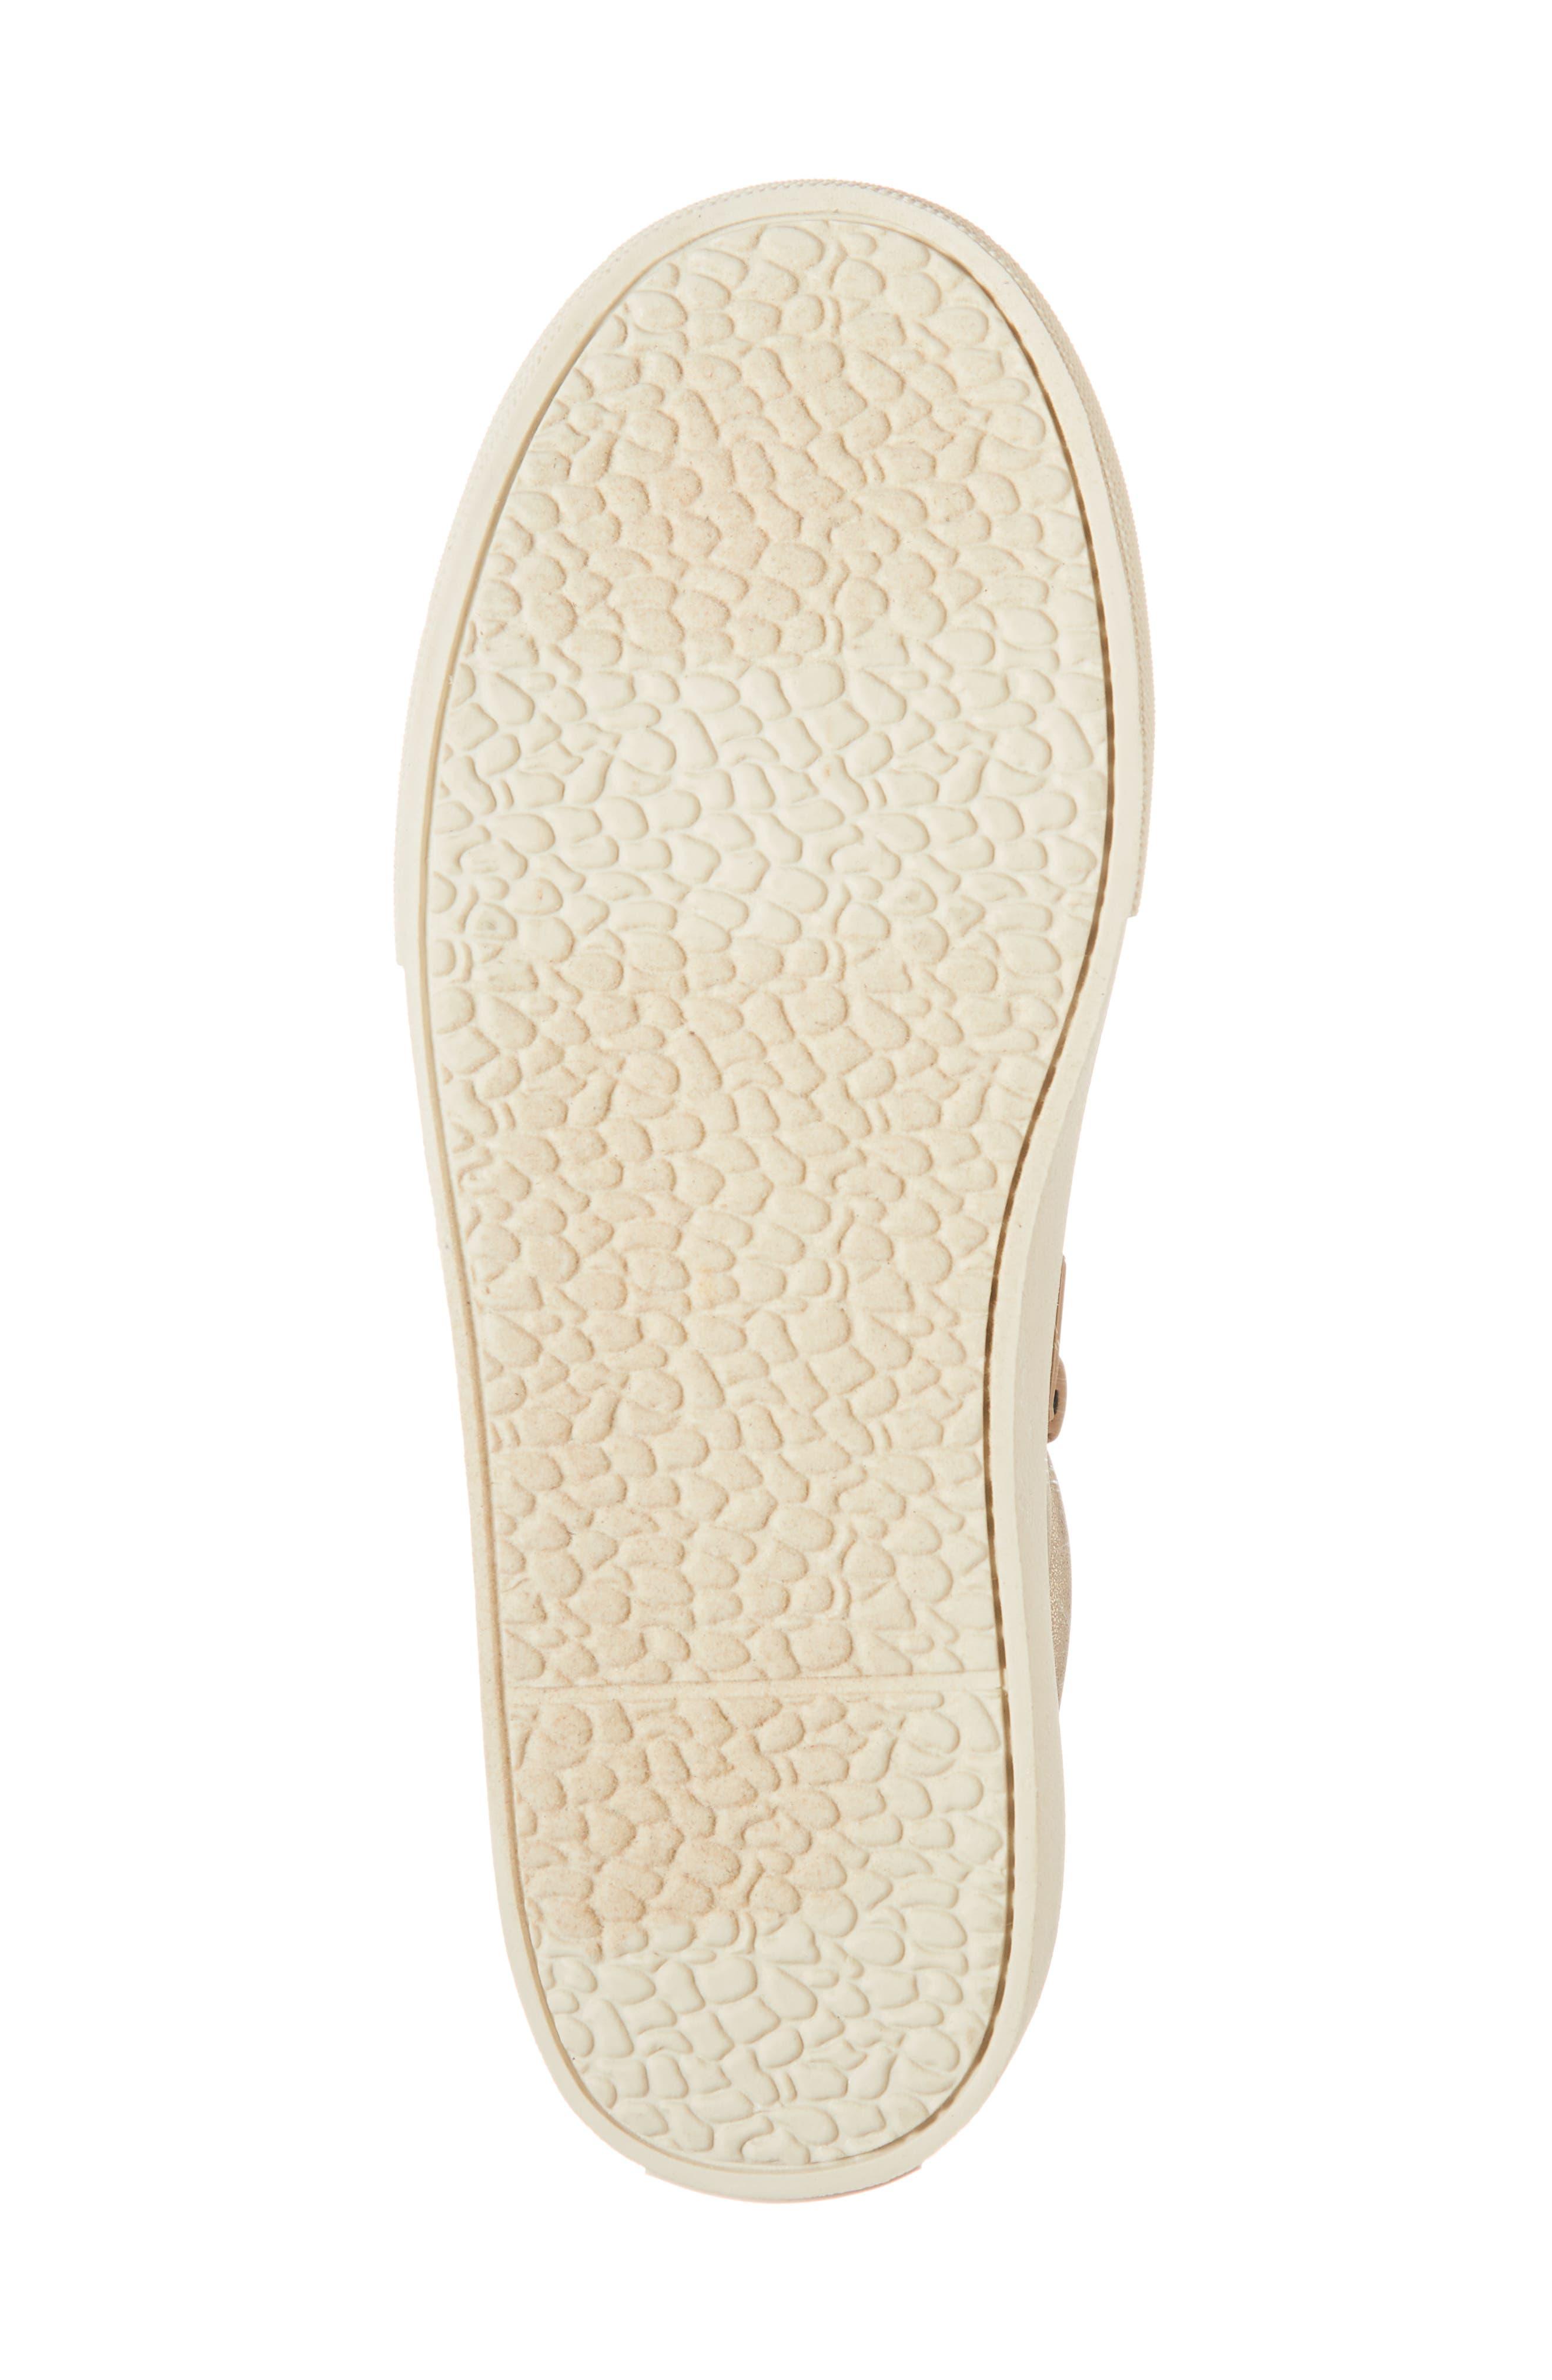 Millie Metallic Pom Sneaker,                             Alternate thumbnail 6, color,                             GOLD METALLIC FAUX LEATHER